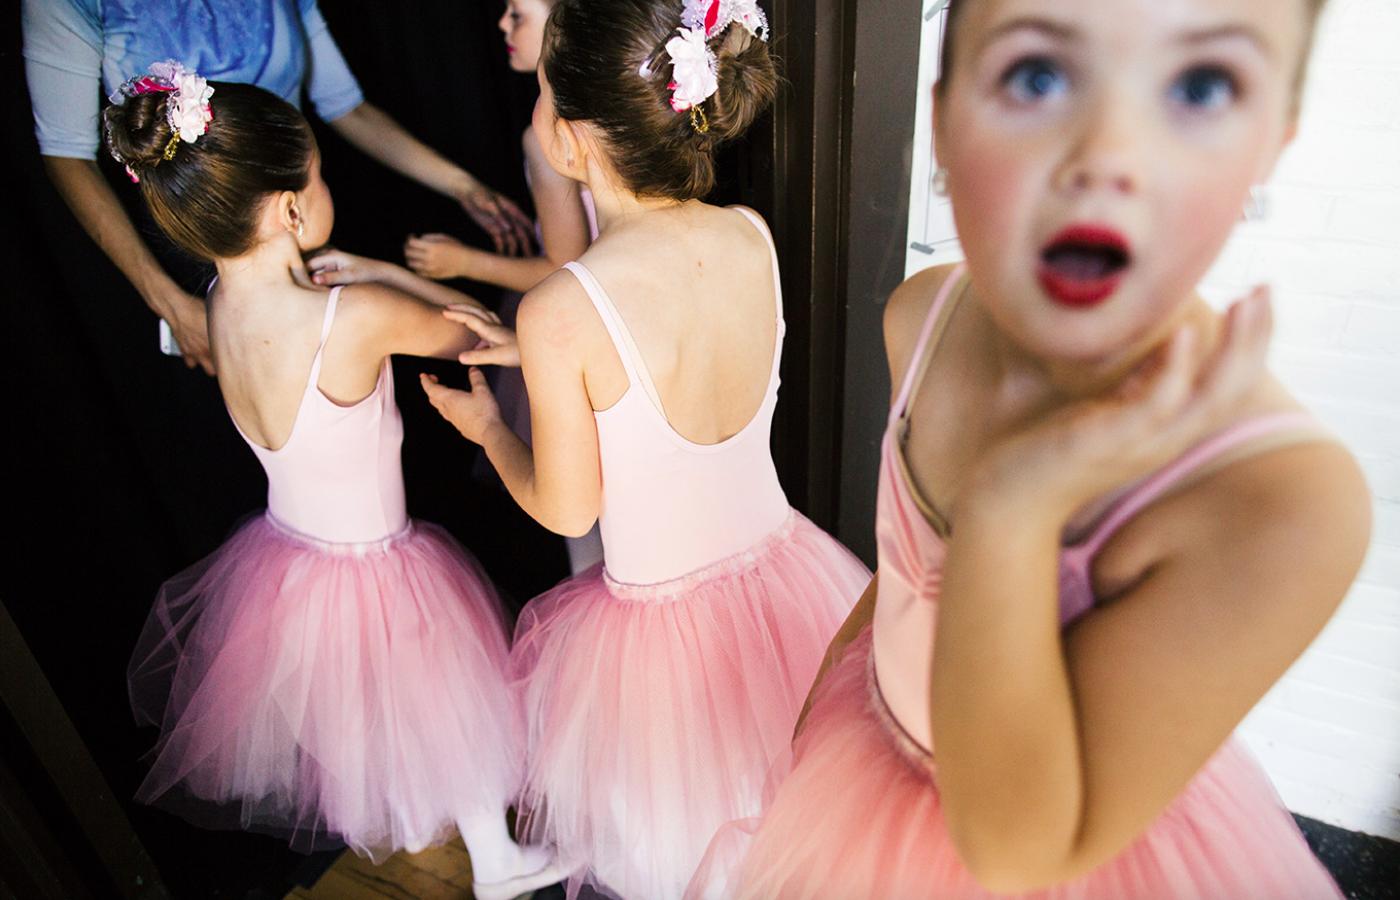 Young Ballet Dancers